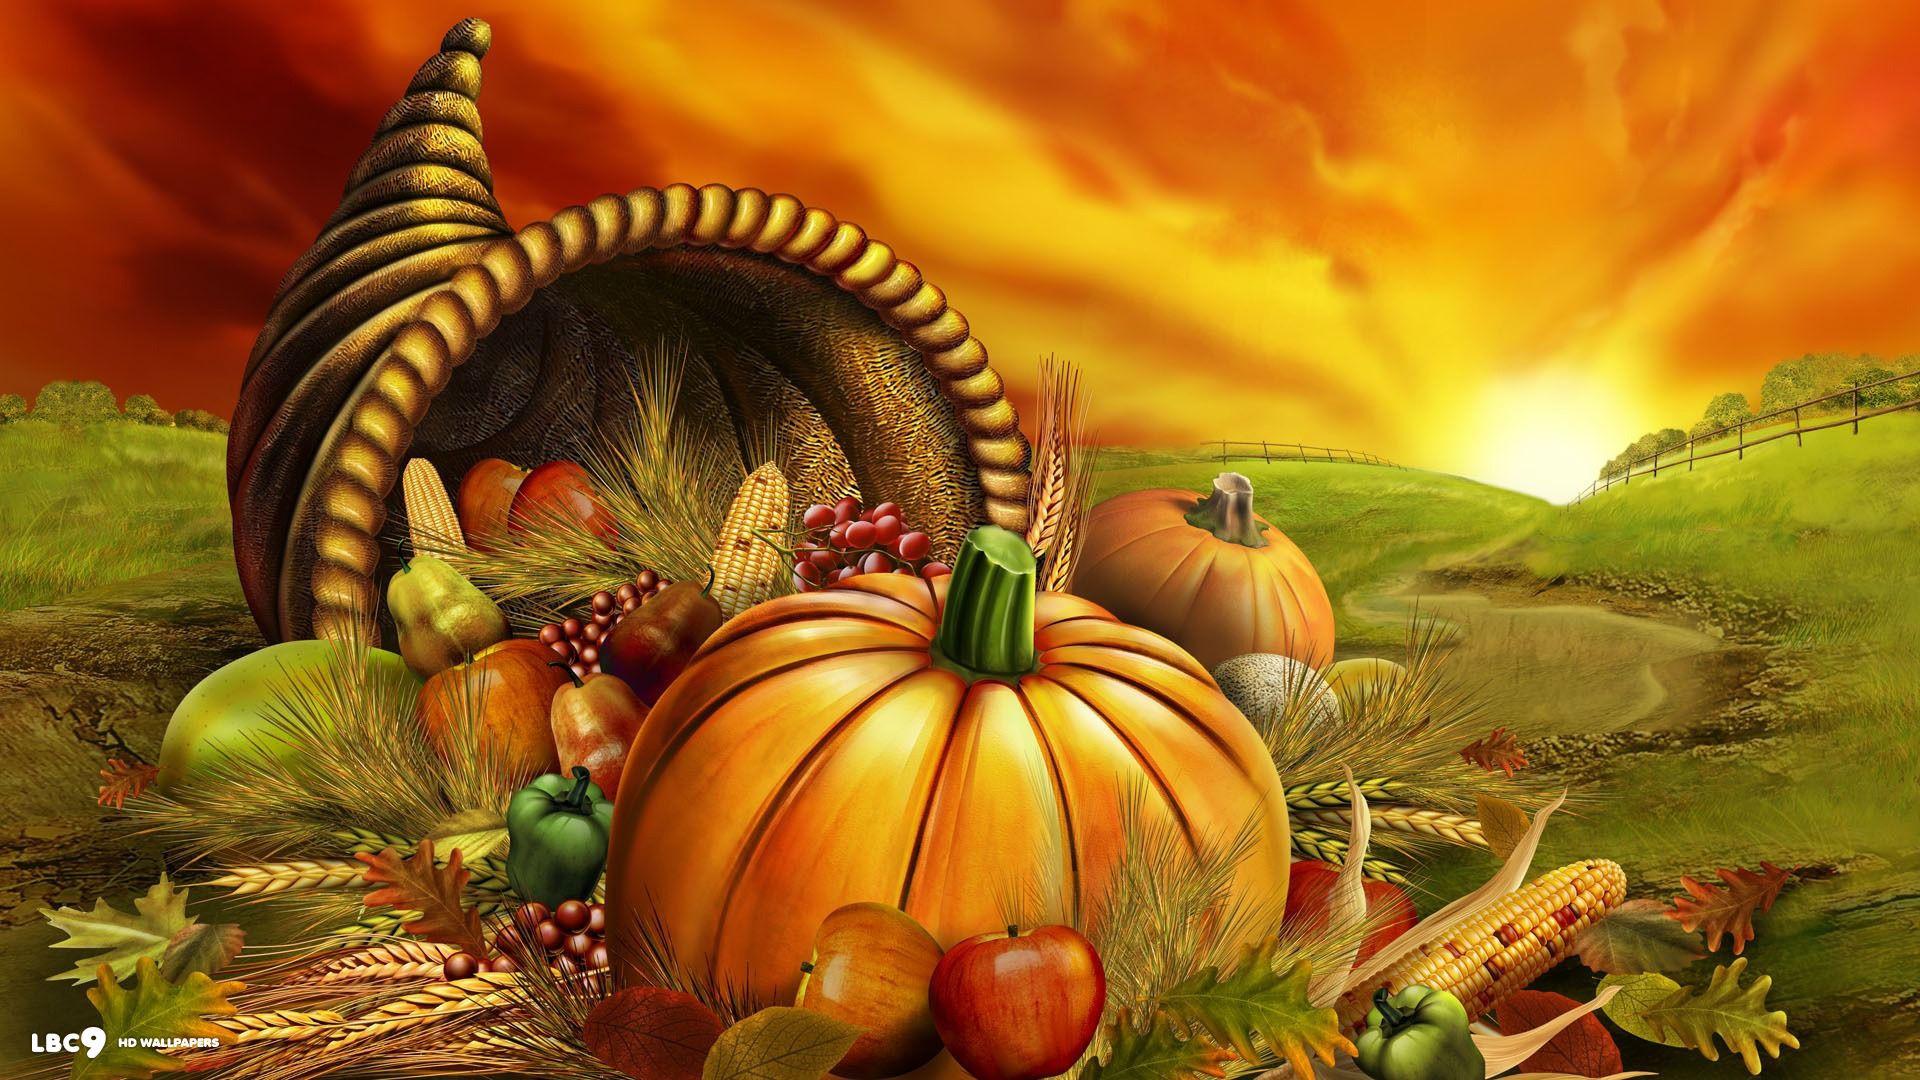 thanksgiving day autumn fruit harvest pumpkin orange sunset holiday desktop  background